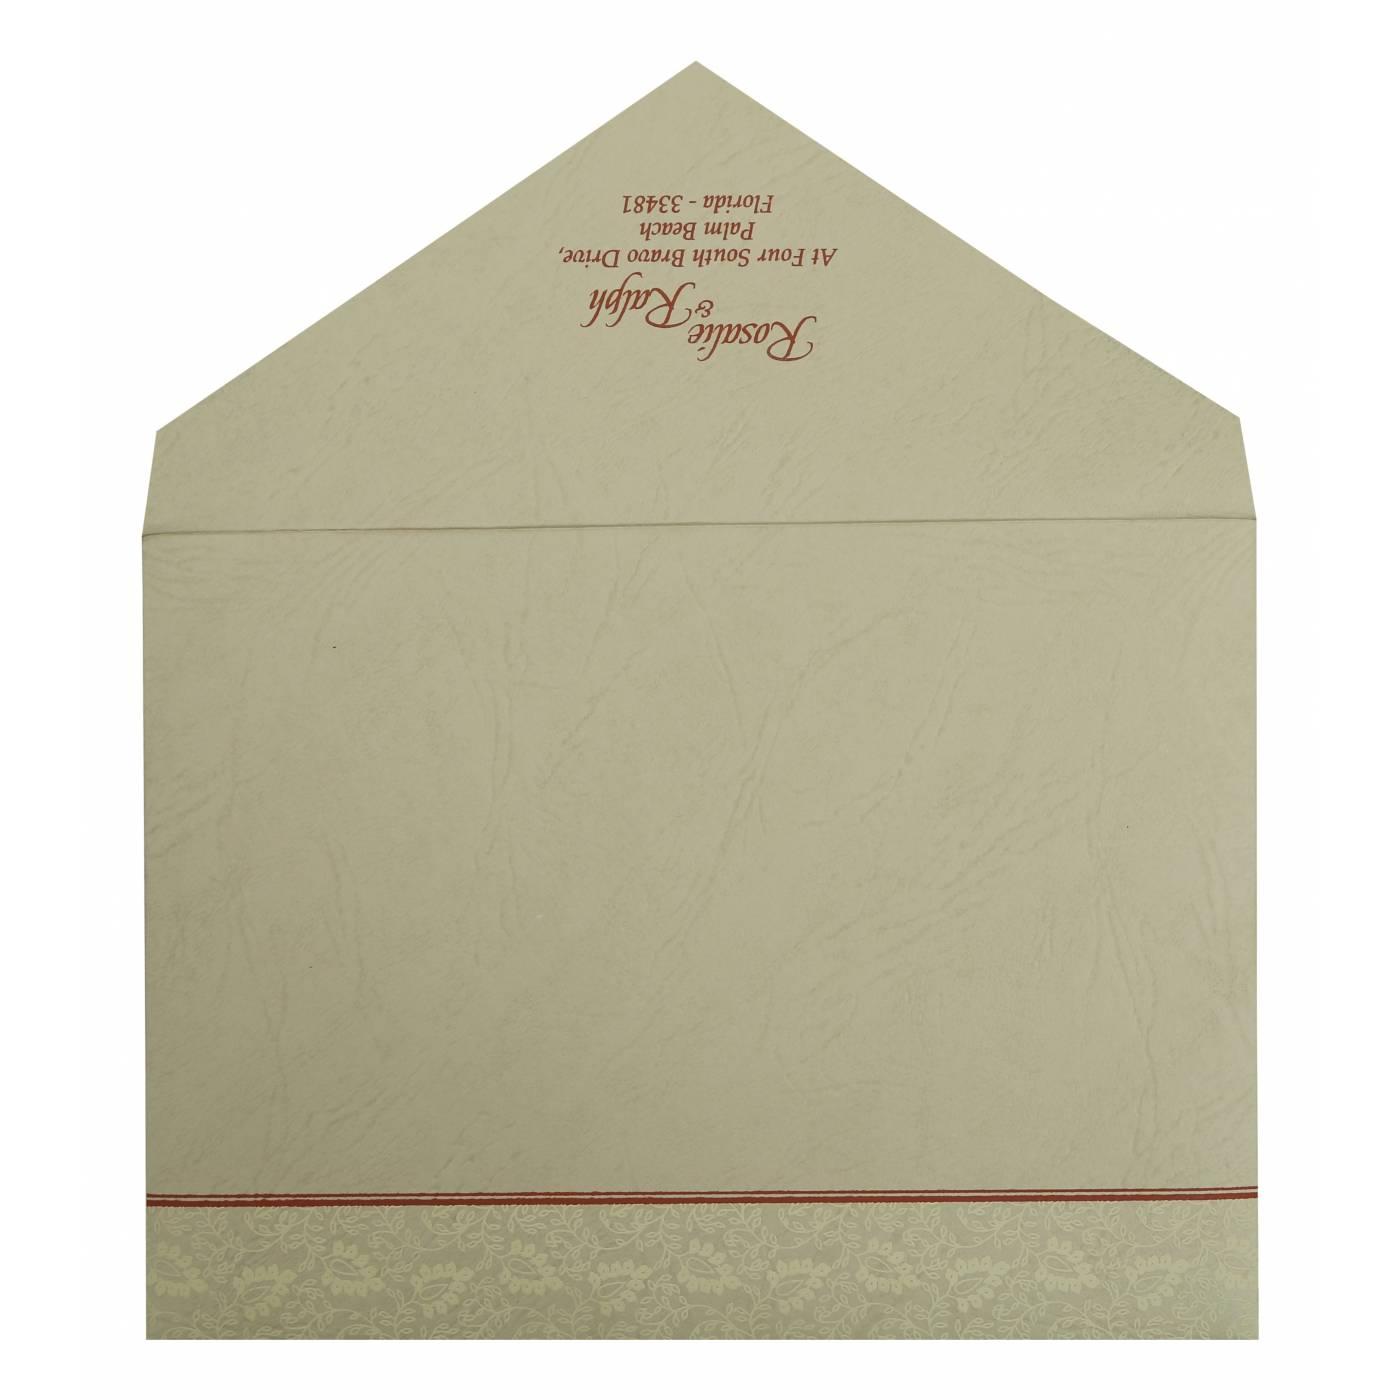 BRICK RED MATTE PAISLEY THEMED - SCREEN PRINTED WEDDING INVITATION : CD-811B - IndianWeddingCards